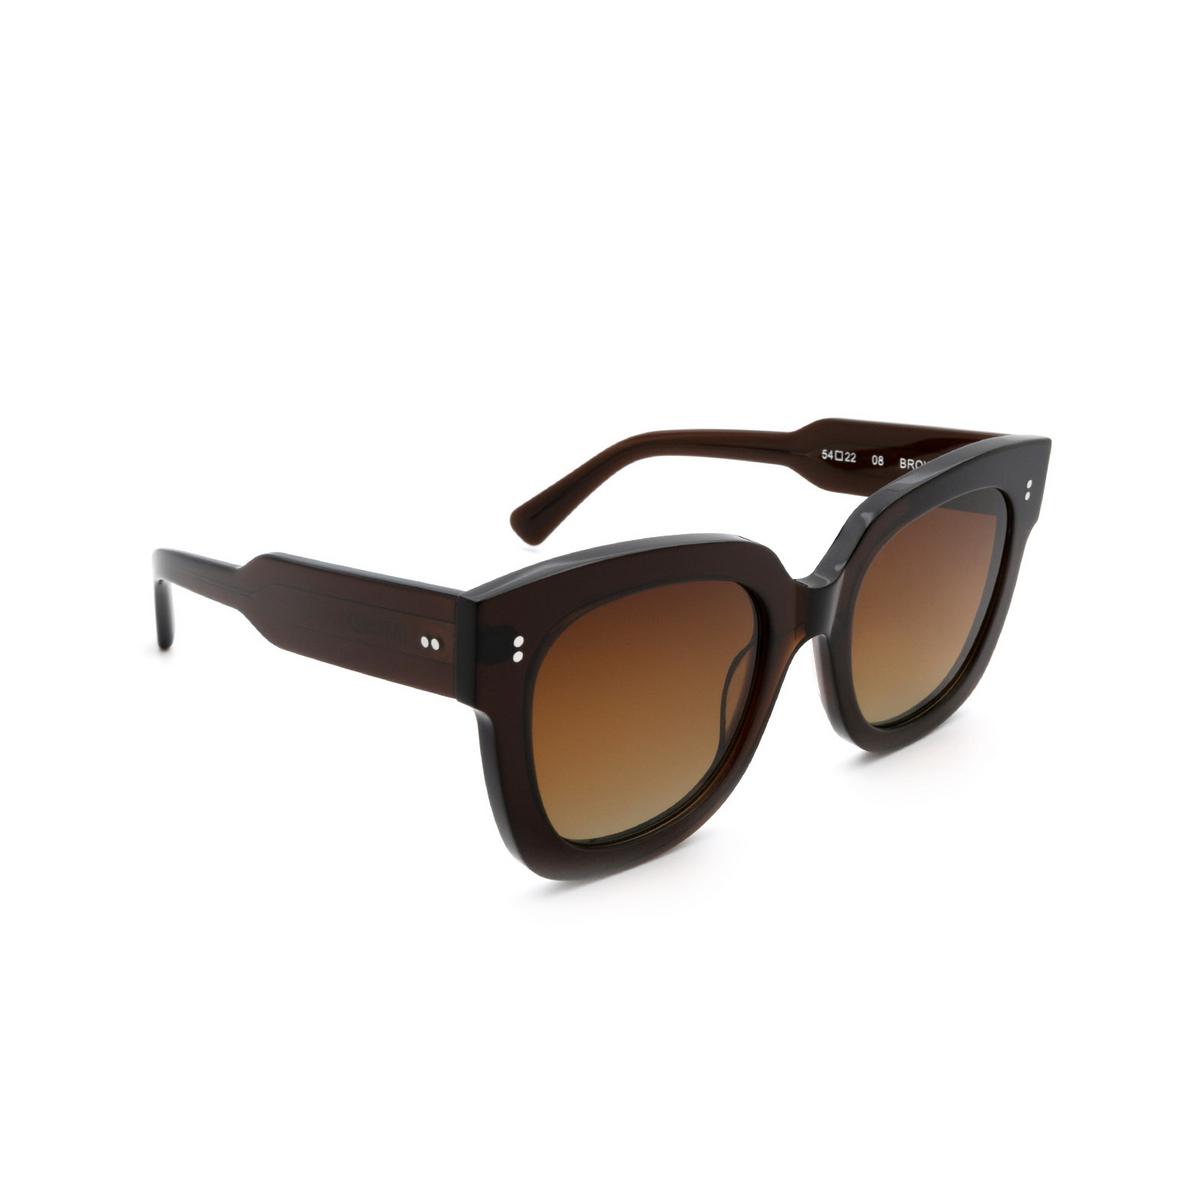 Chimi® Square Sunglasses: 08 color Brown - three-quarters view.